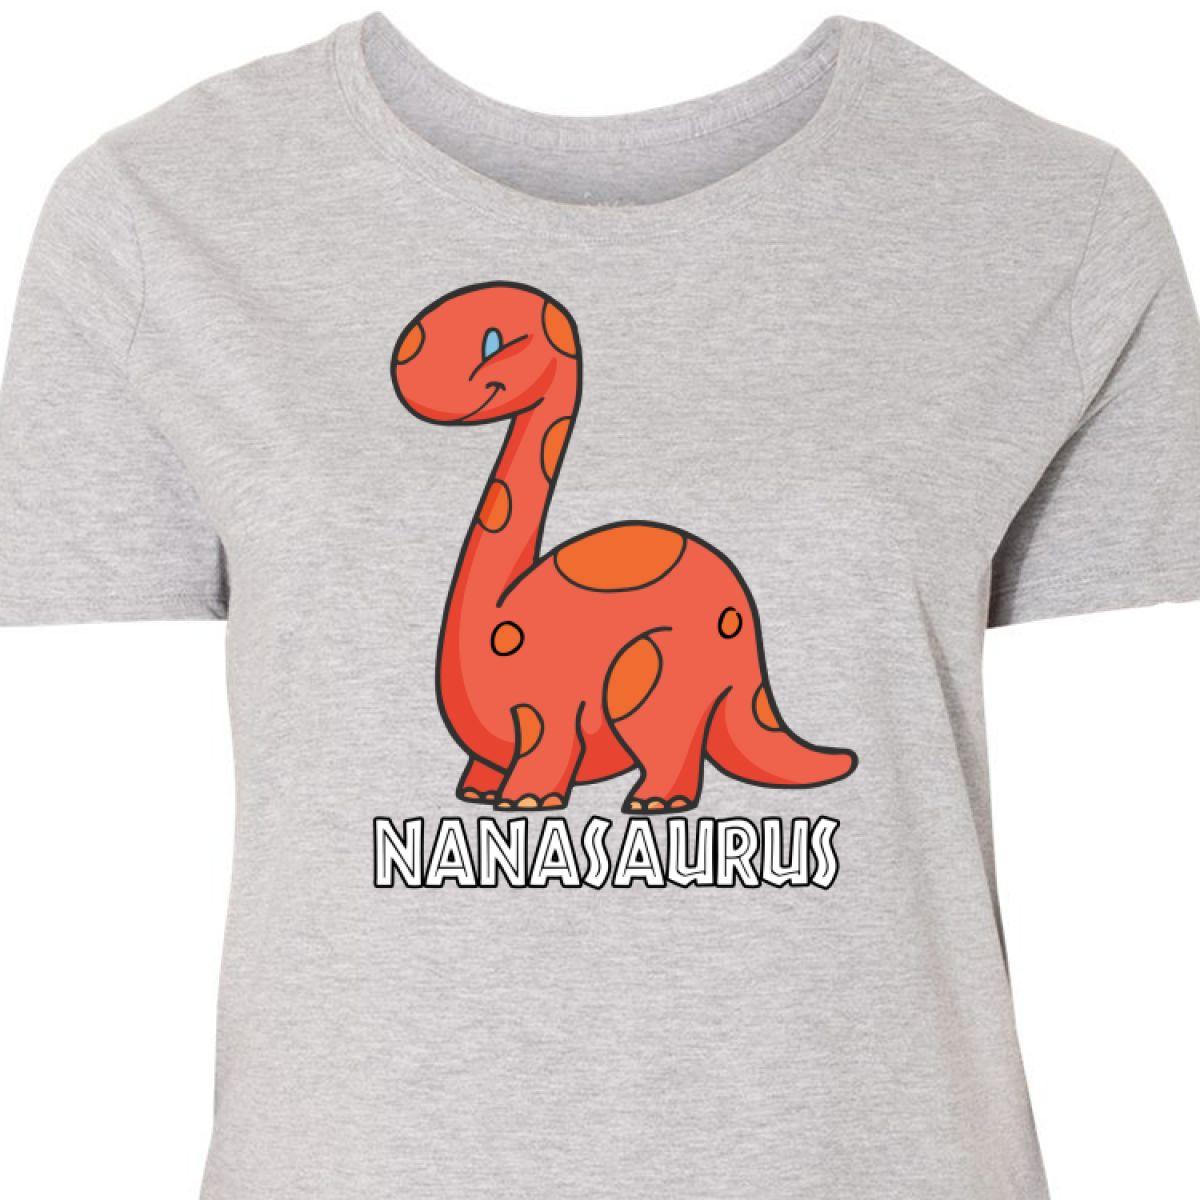 c7b342e9d4f Details about Inktastic Nanasaurus Women s Plus Size T-Shirt Grandmother  Nana Cute Dinosaur My